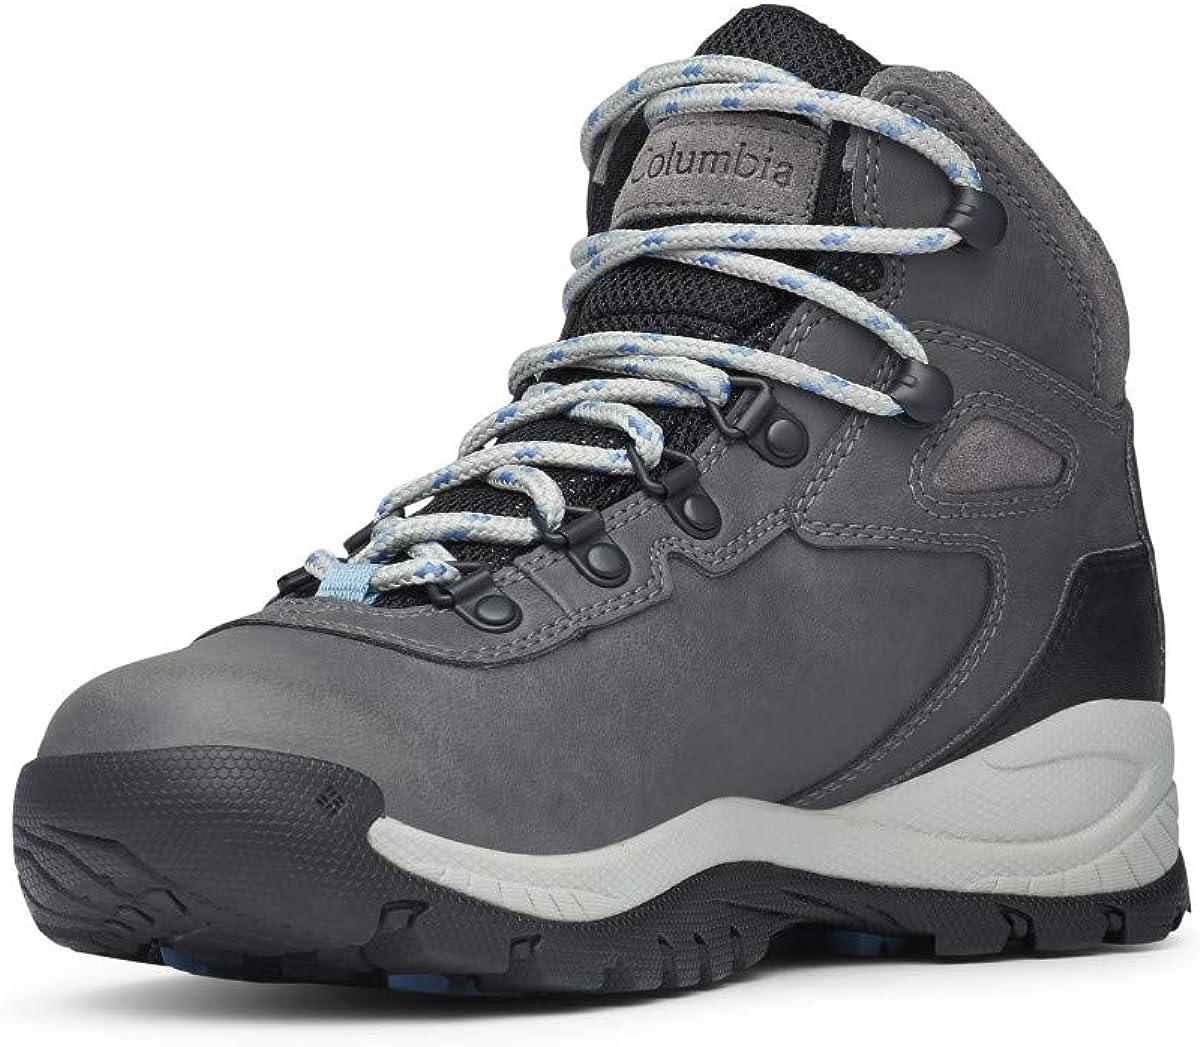 Medium Columbia Womens Newton Ridge Plus Hiking Shoes